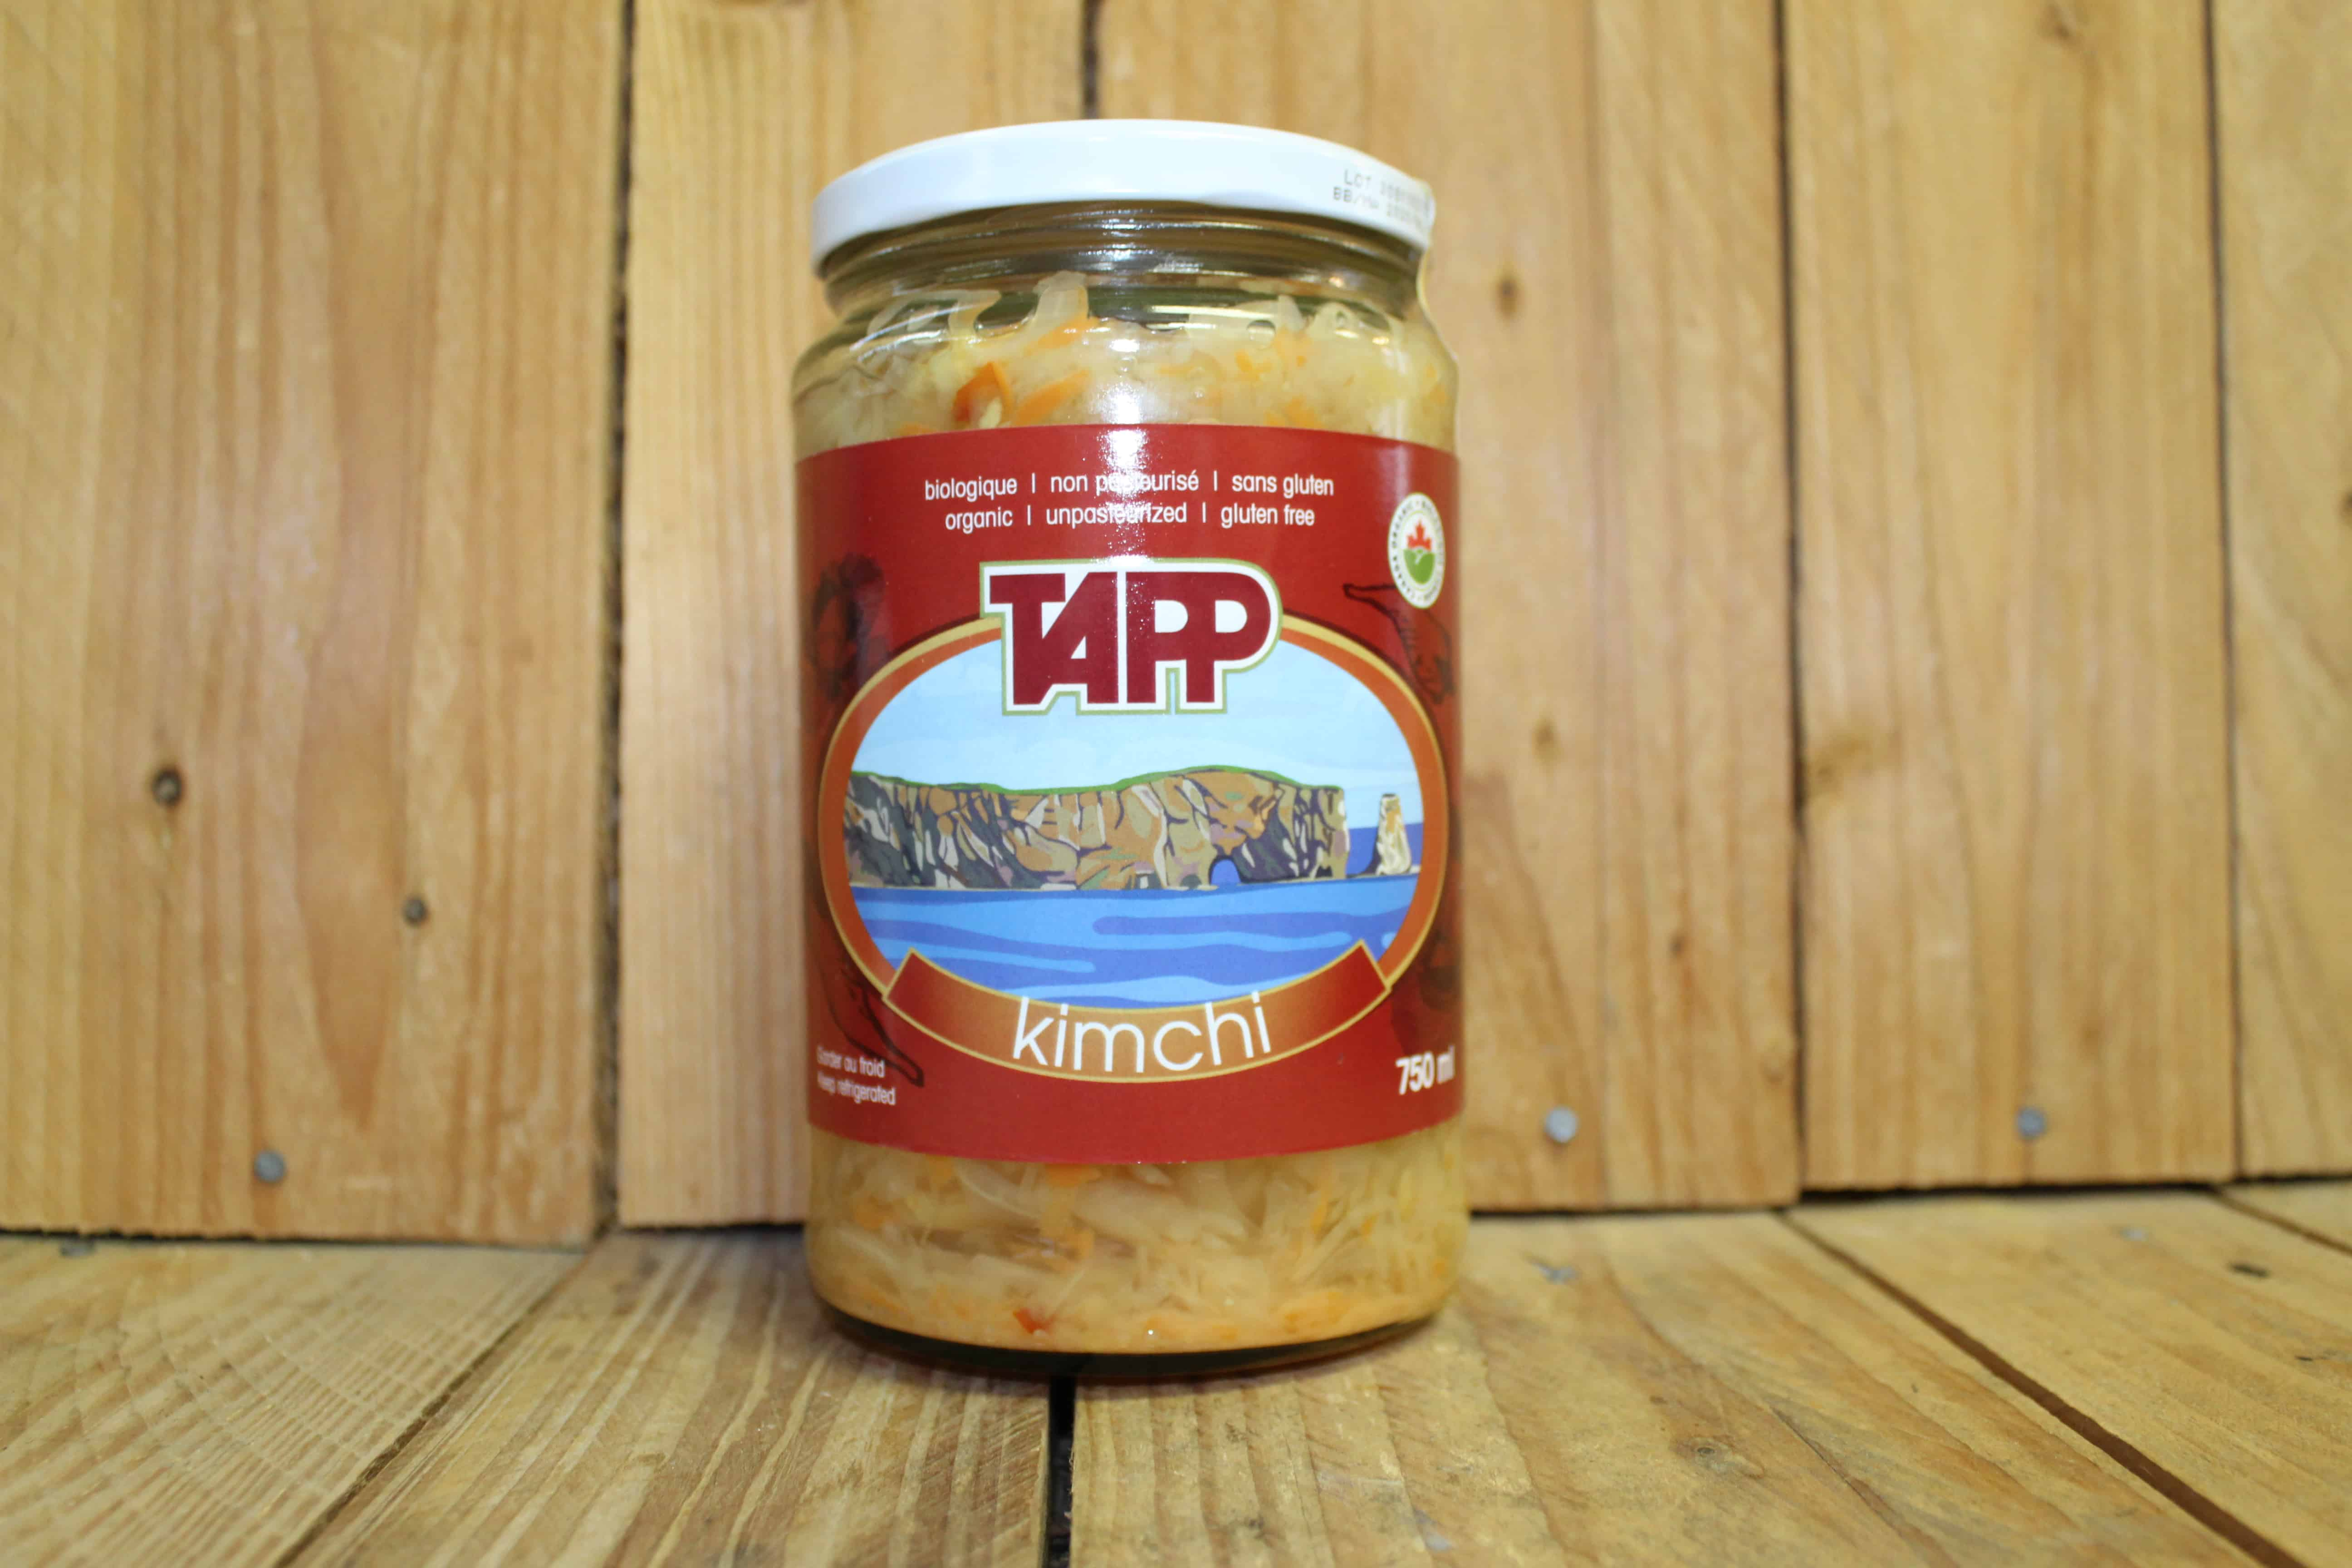 Tapp – Kimchi (750ml Jar)